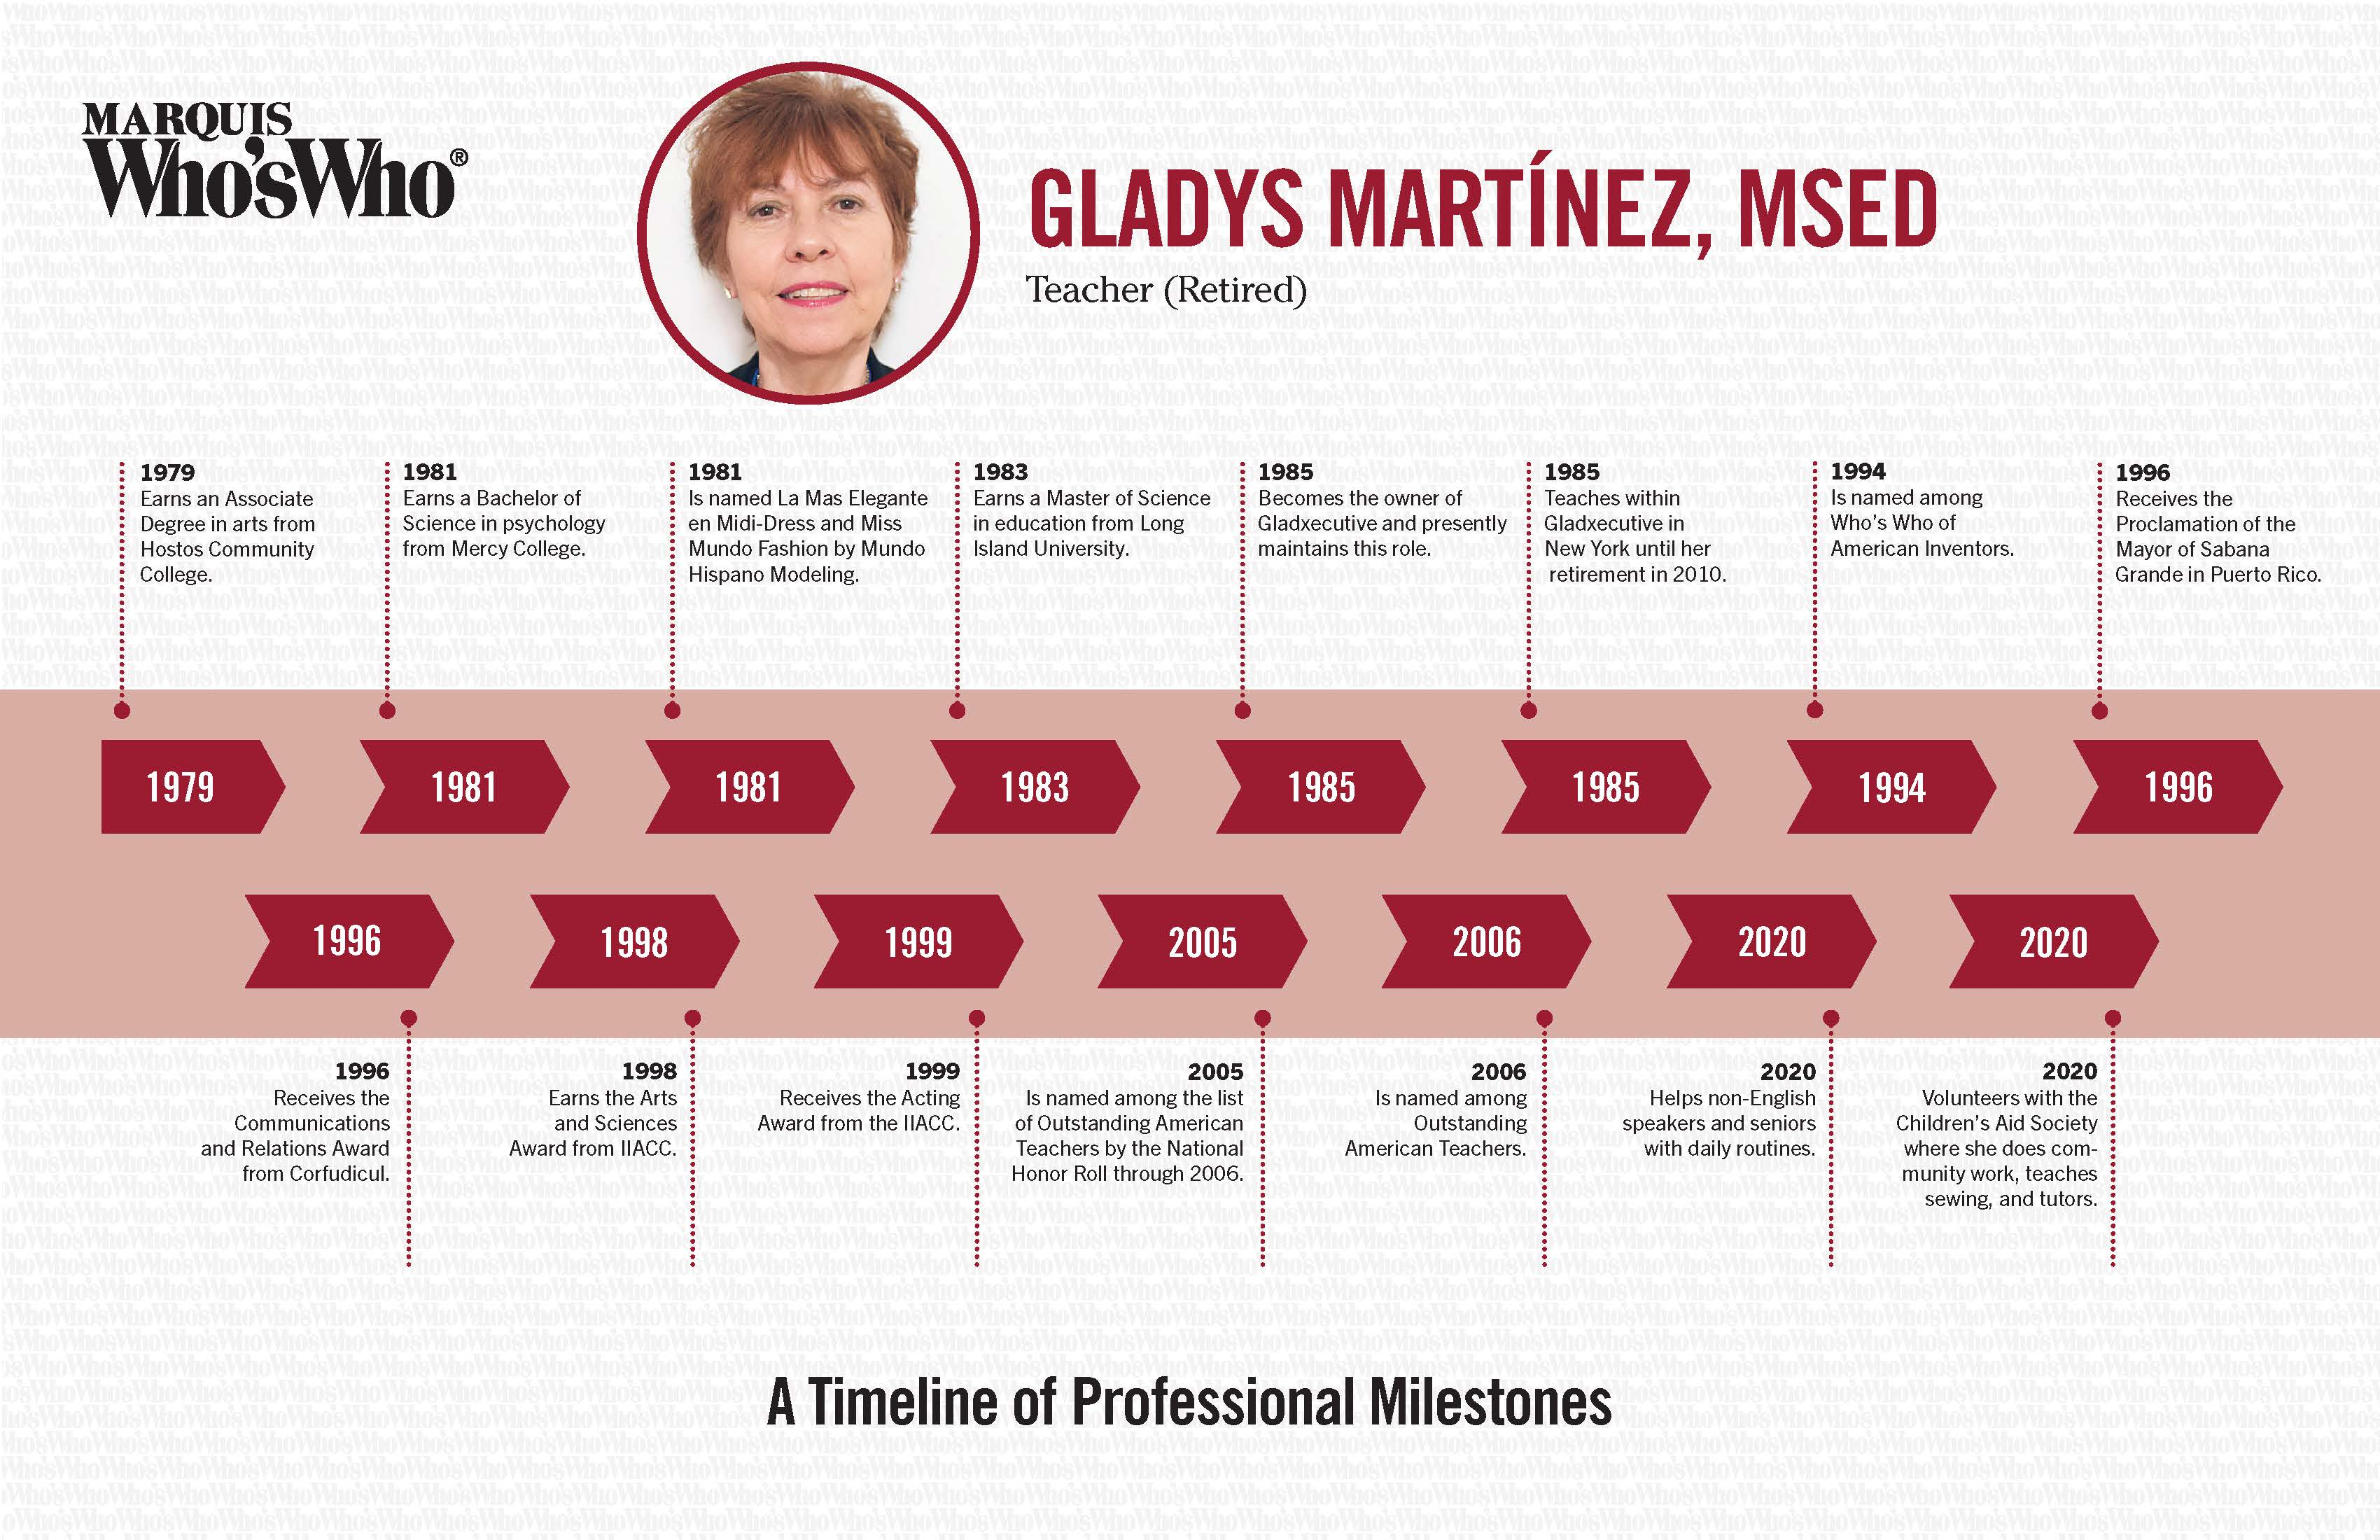 Gladys Martínez